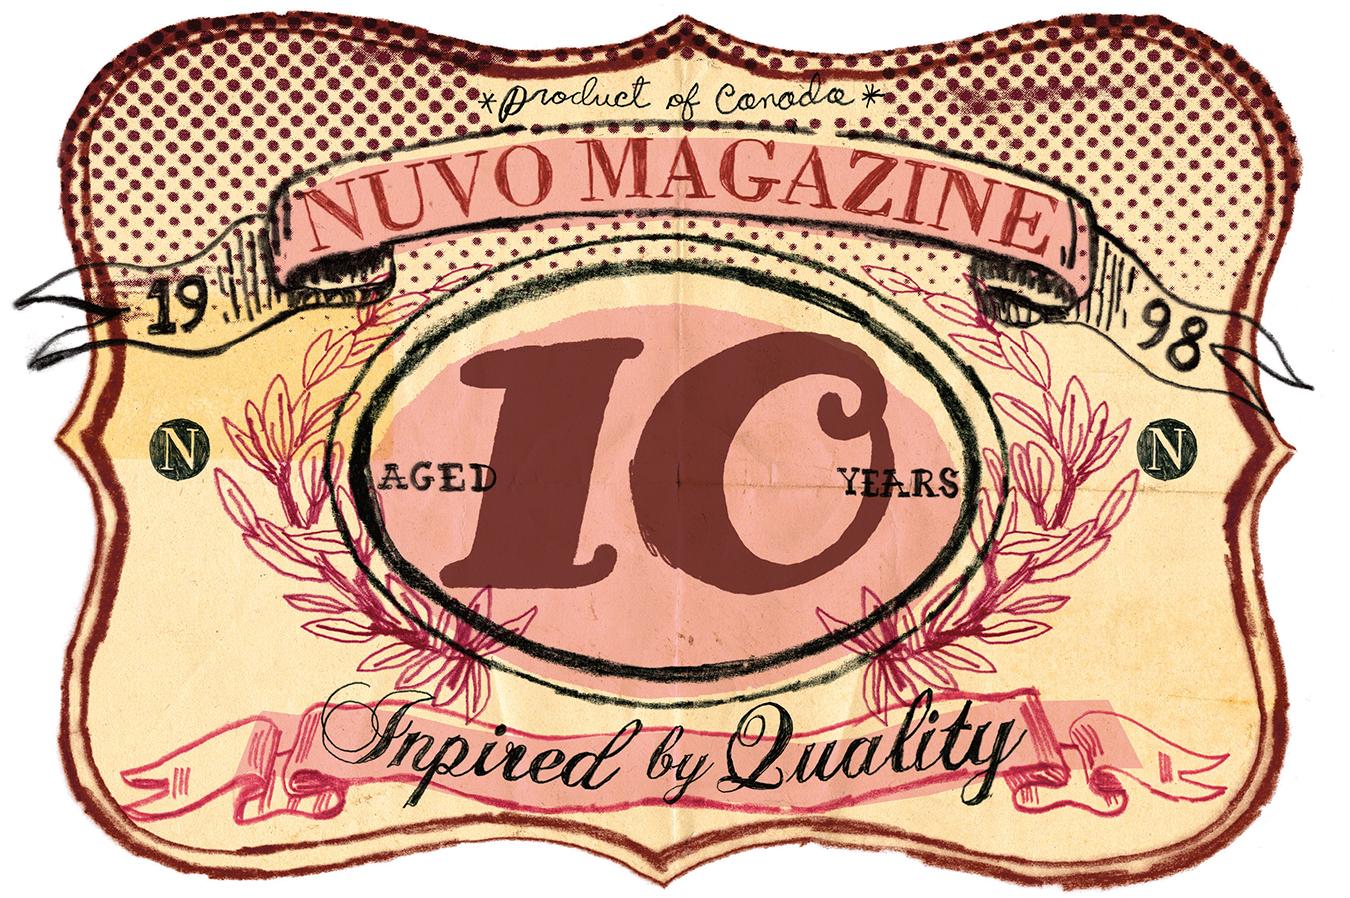 NUVO Magazine: A 10-Year Celebration